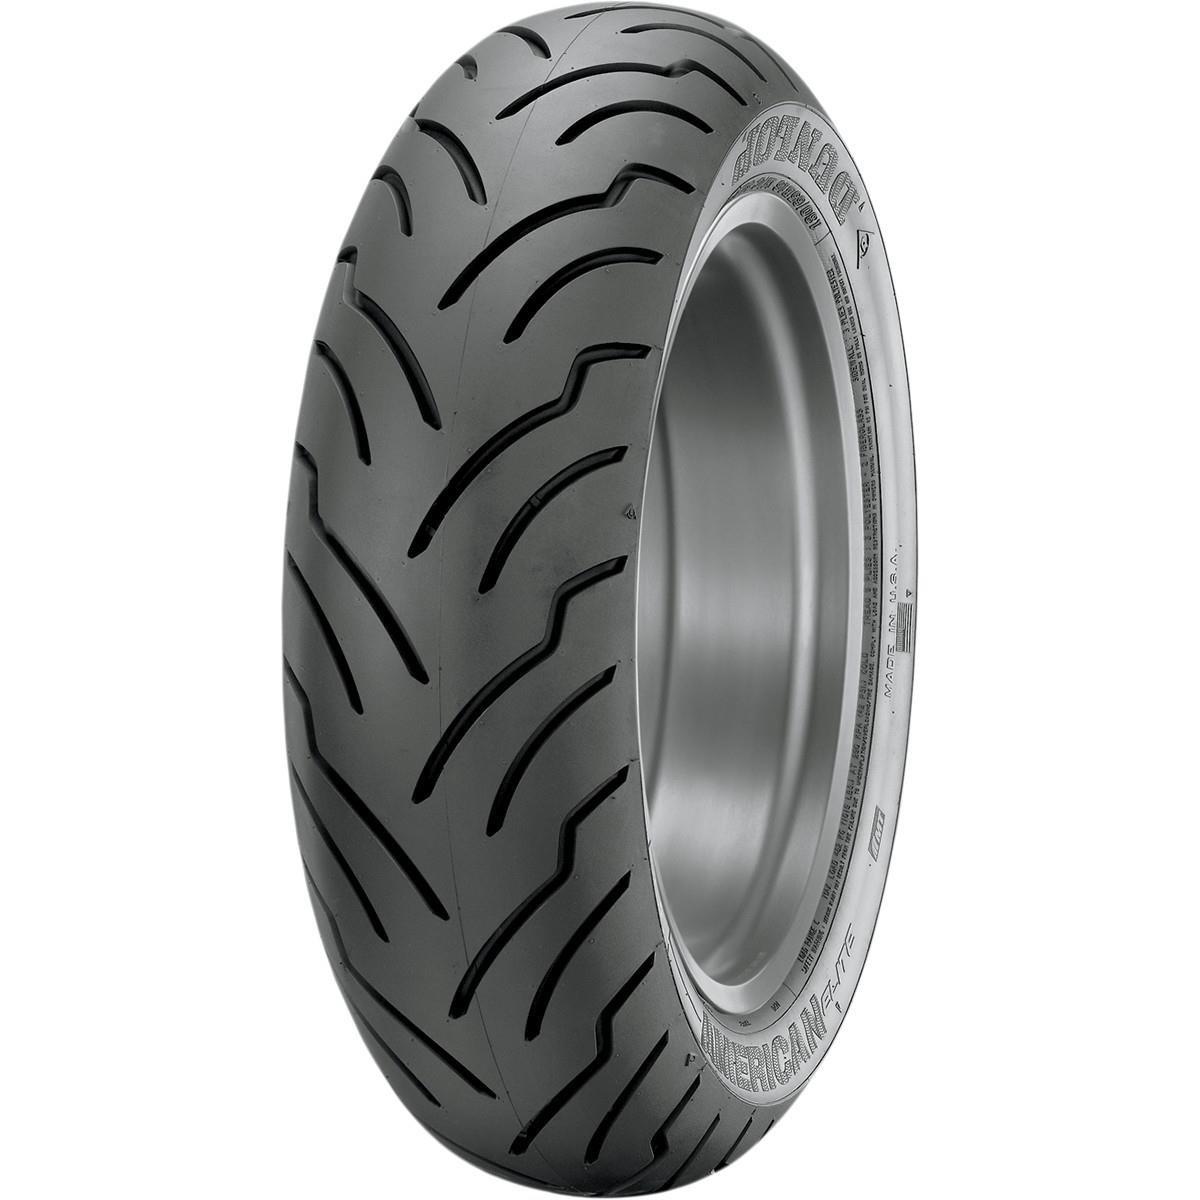 Dunlop American Elite HD Touring Tire - Rear - 200/55R17